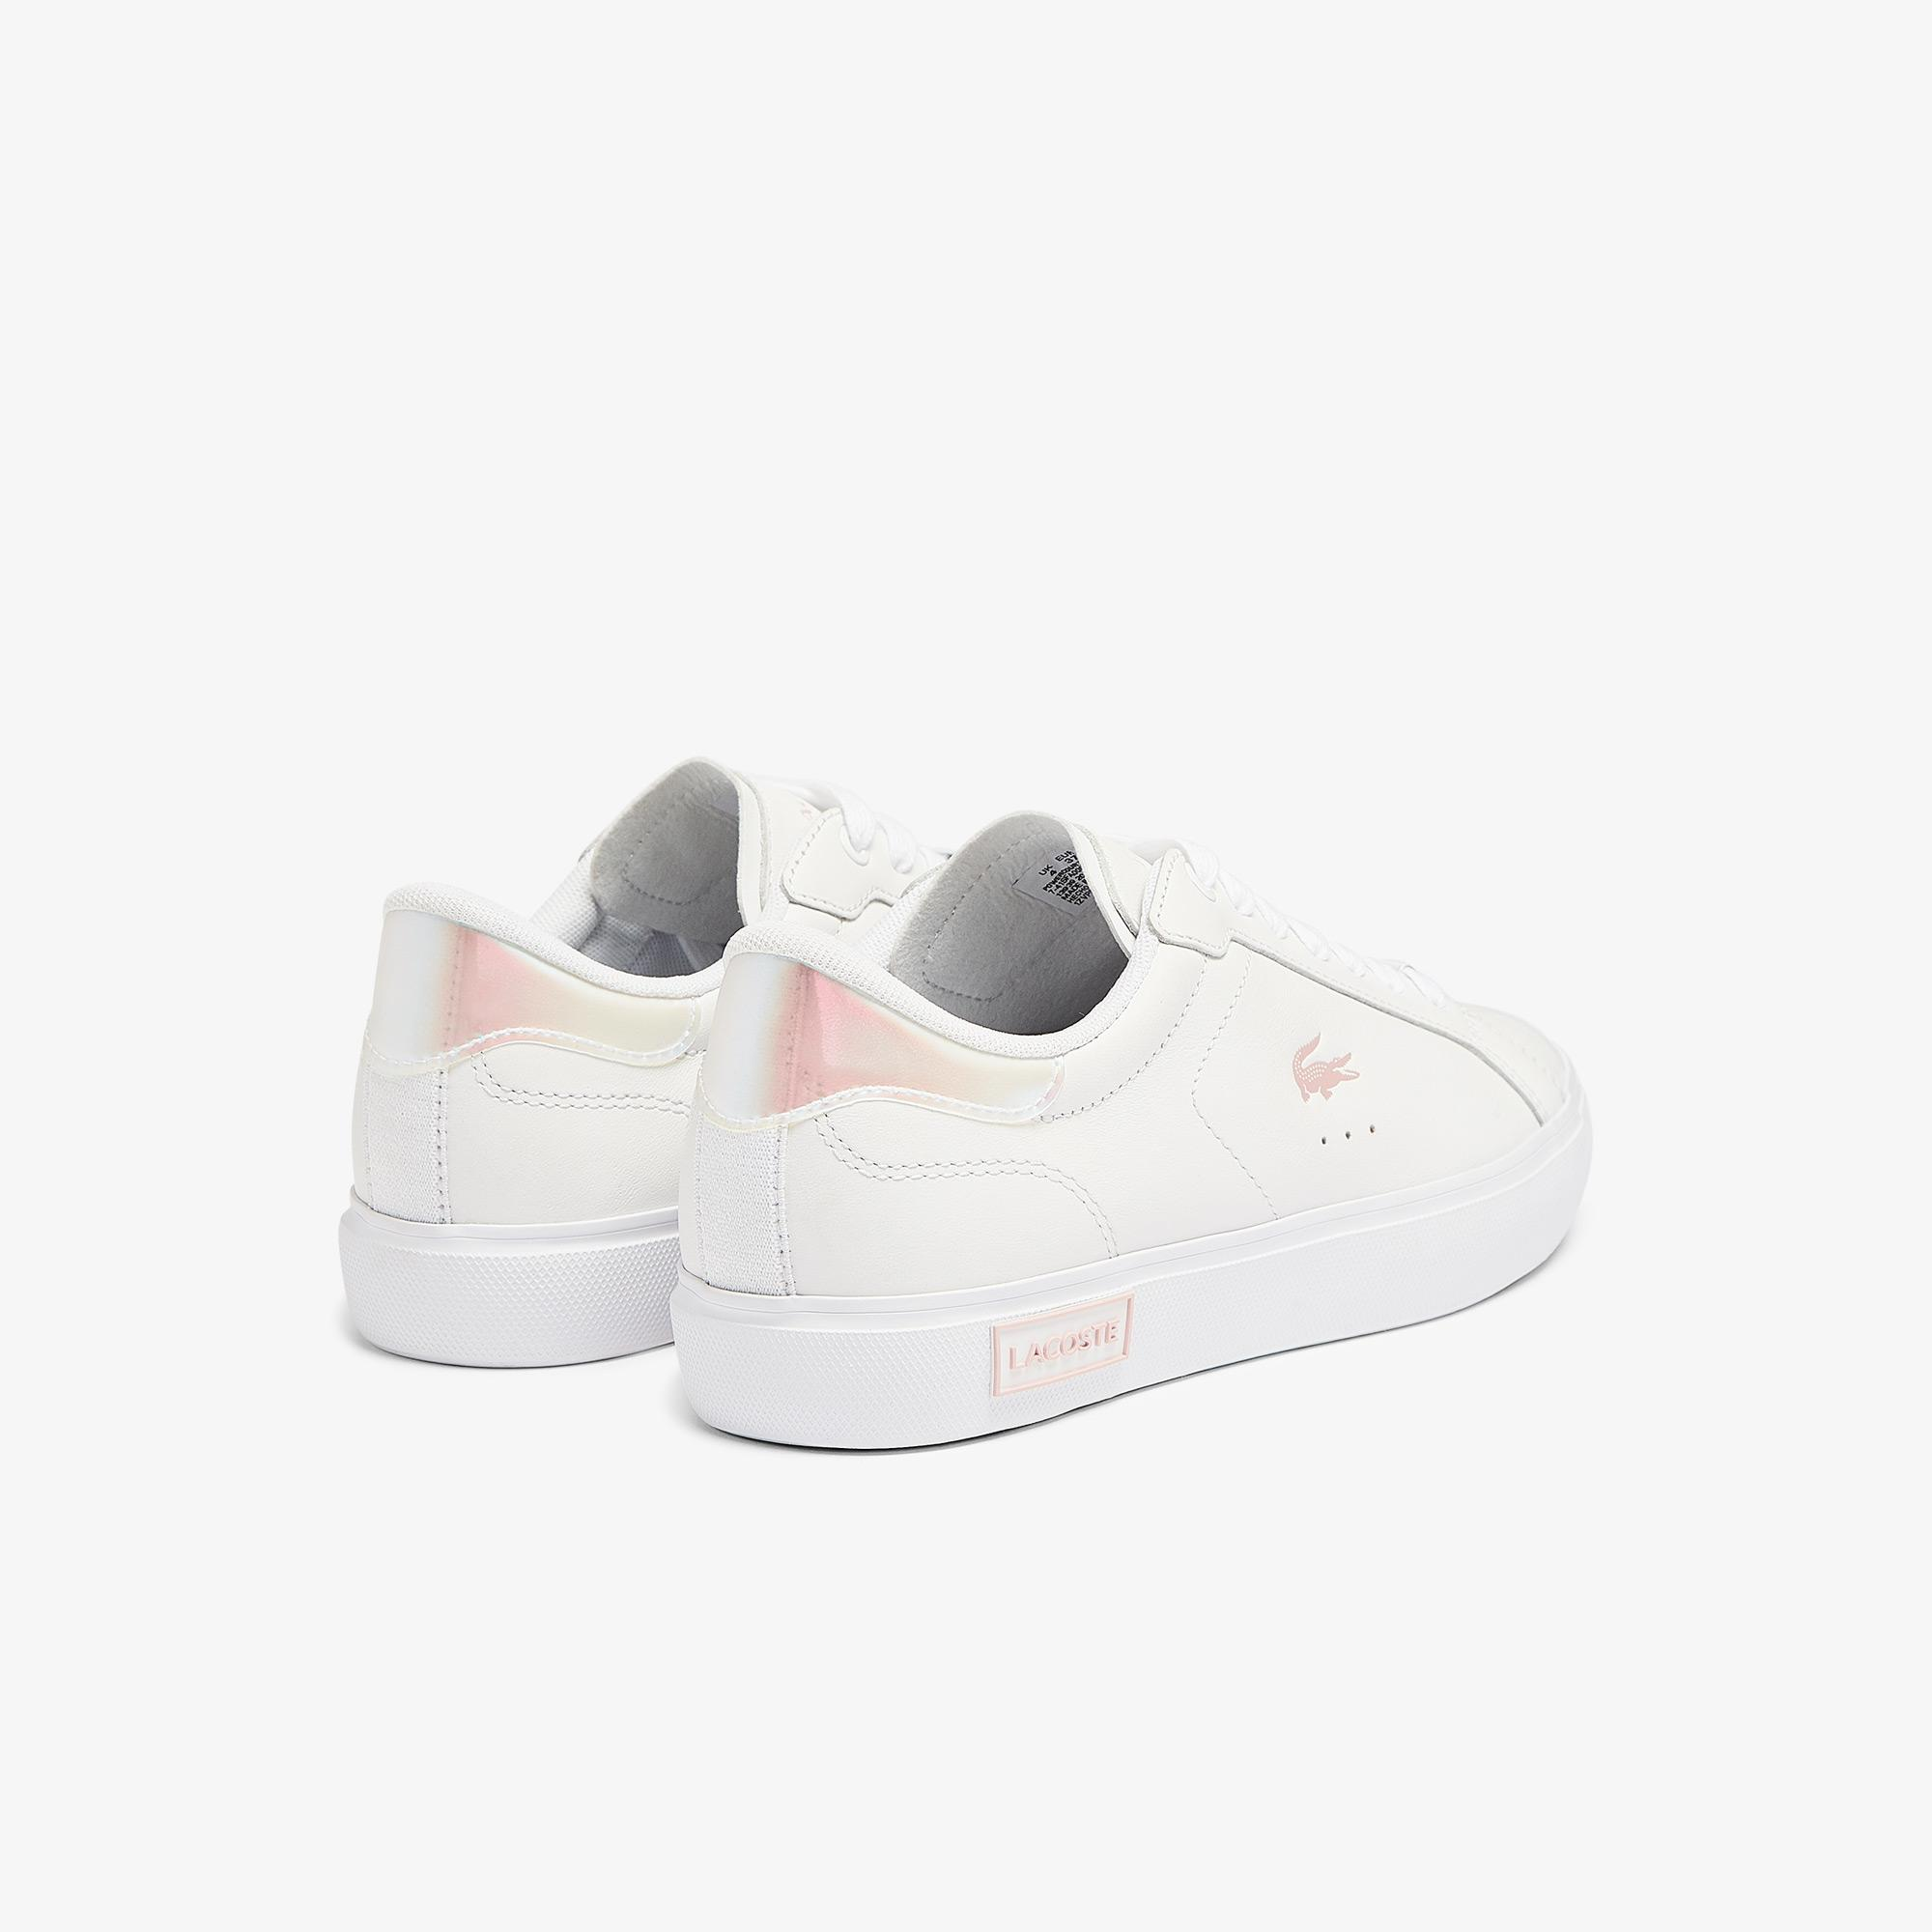 Lacoste Women's Powercourt 0921 1 Sfa Shoes